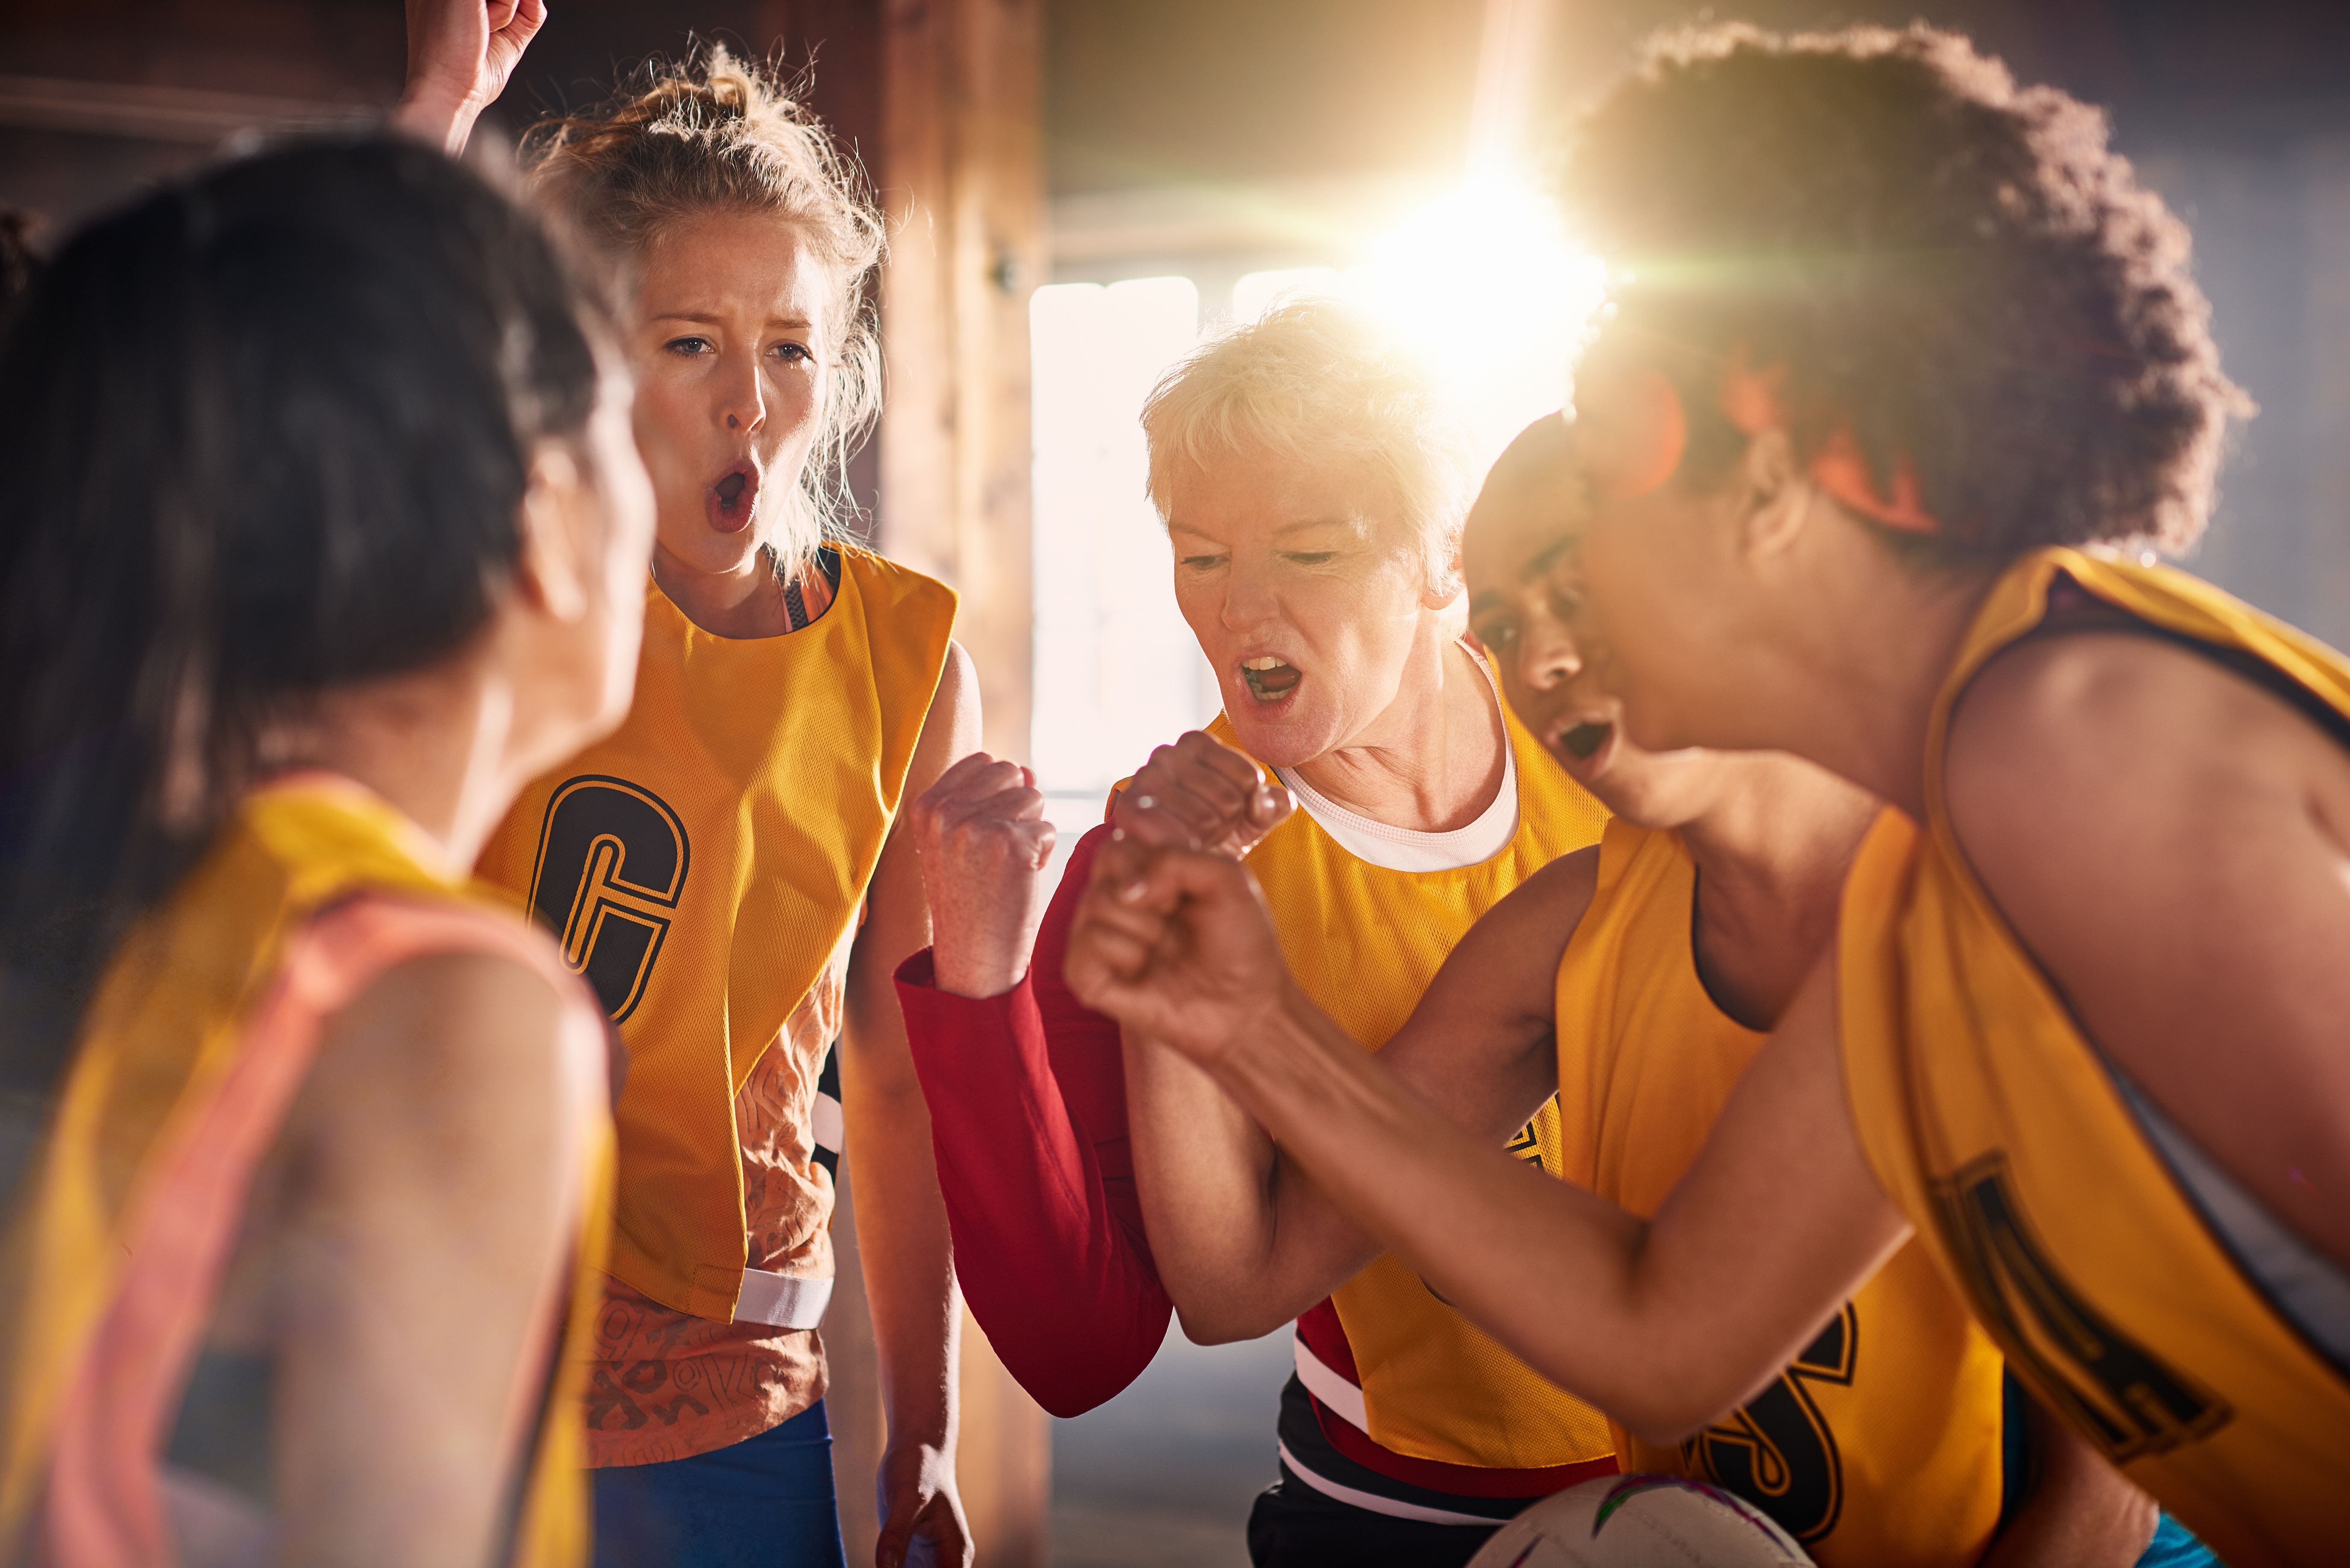 Female netball team preparing to training in gym.